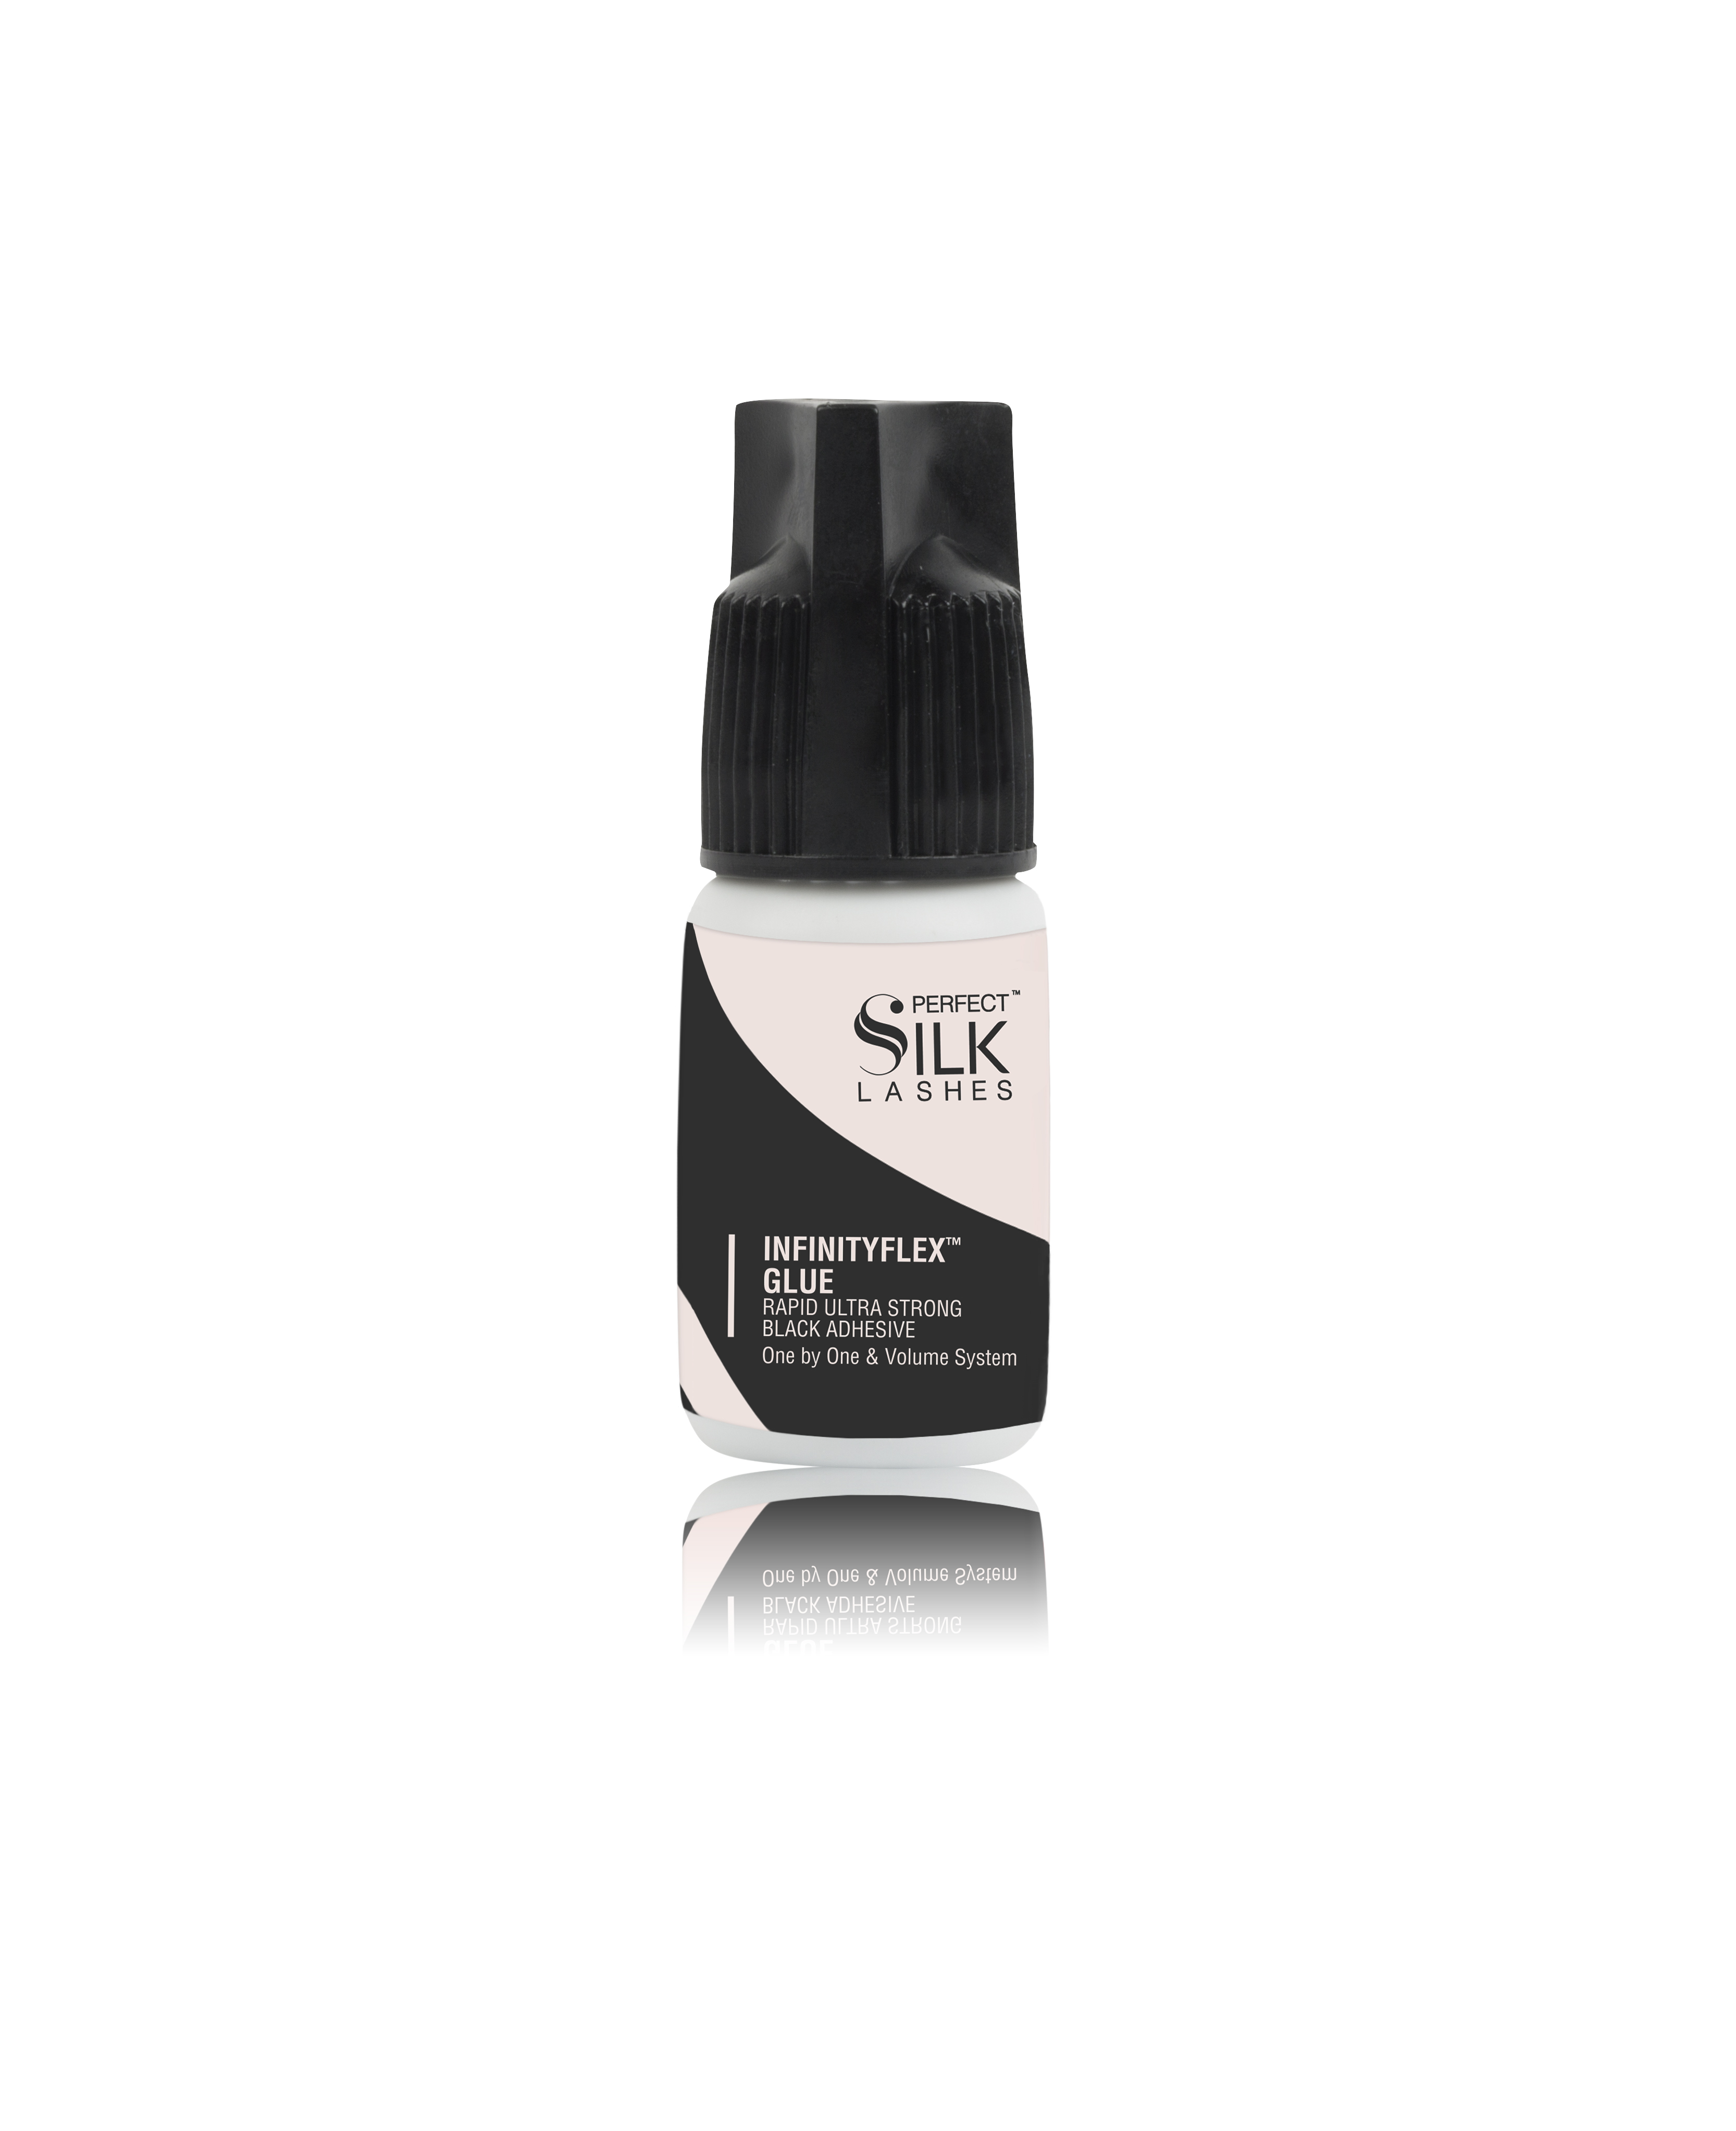 InfinityFlex™ Glue